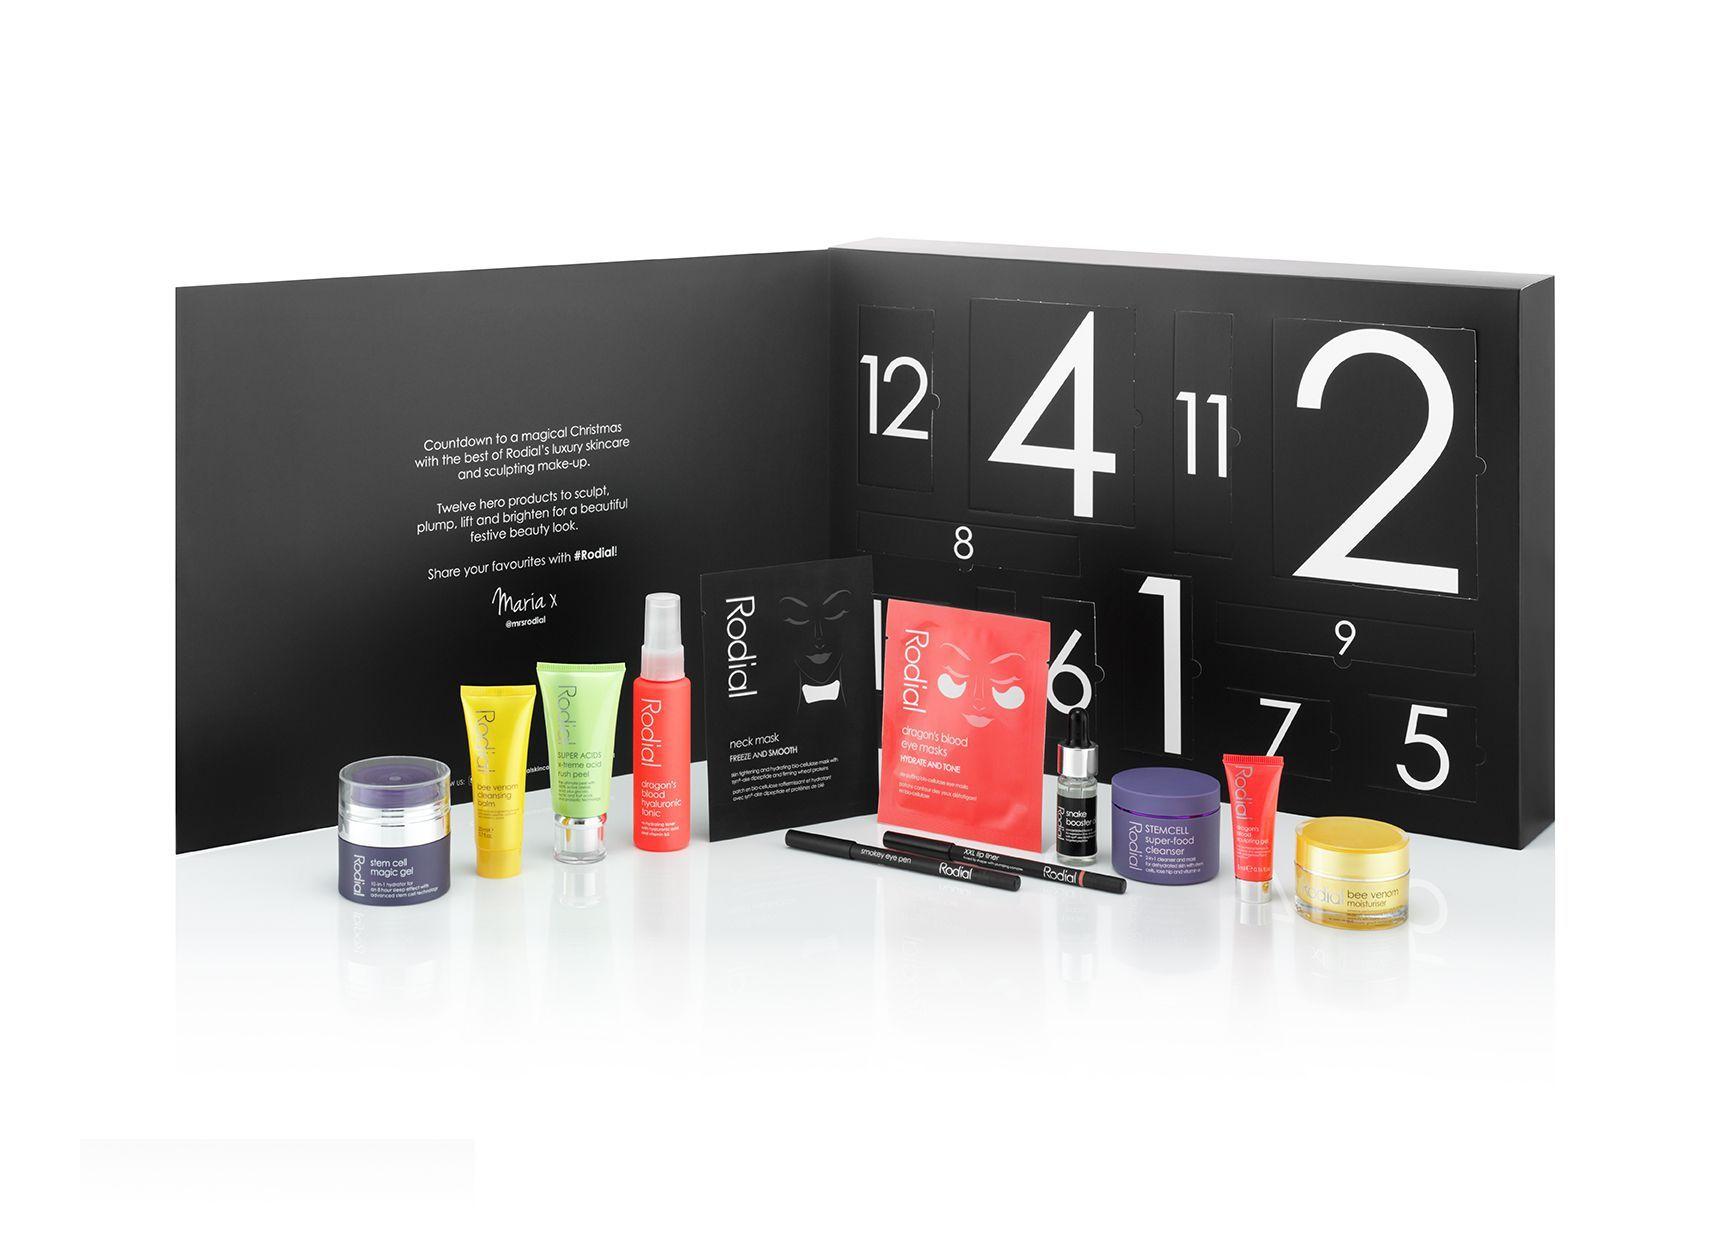 Calendario Nyx.Rodial 12 Days Of Glamour Advent Calendar 2018